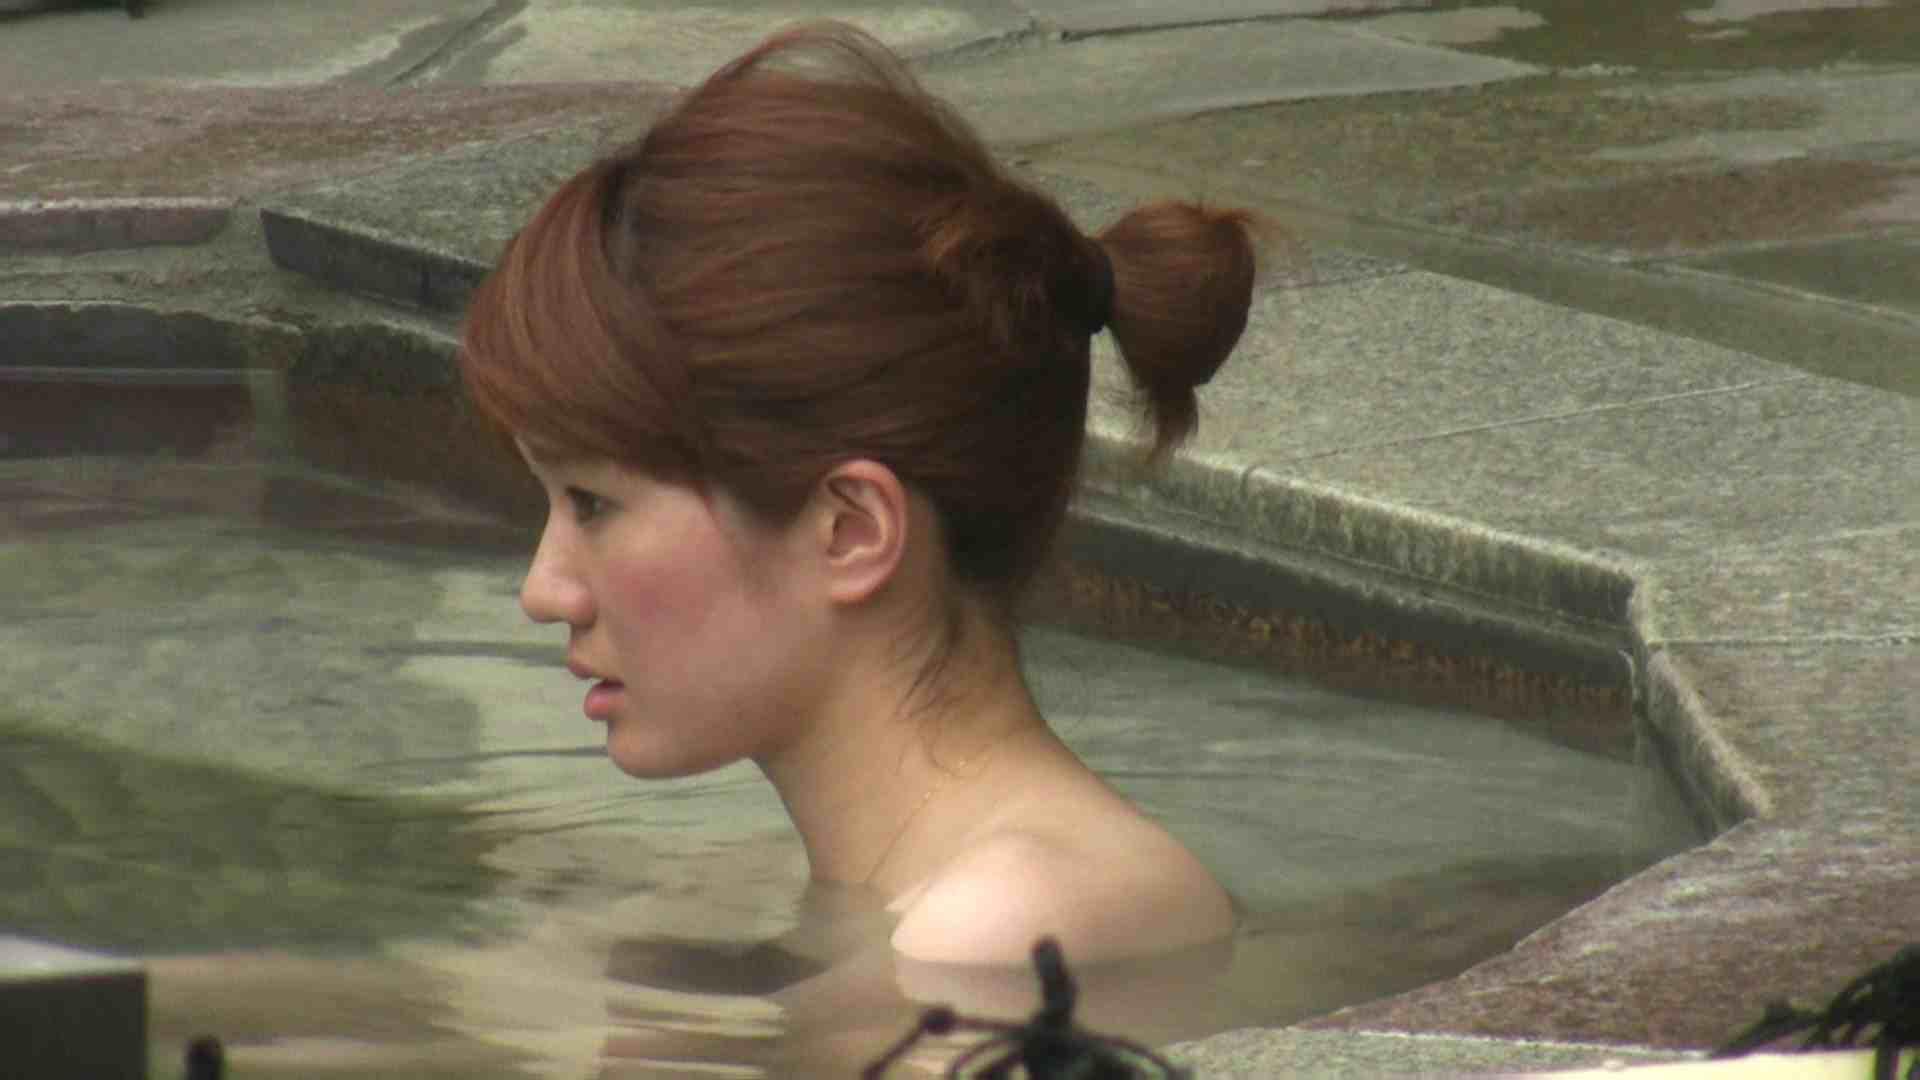 Aquaな露天風呂Vol.110 盗撮映像  46Pix 22